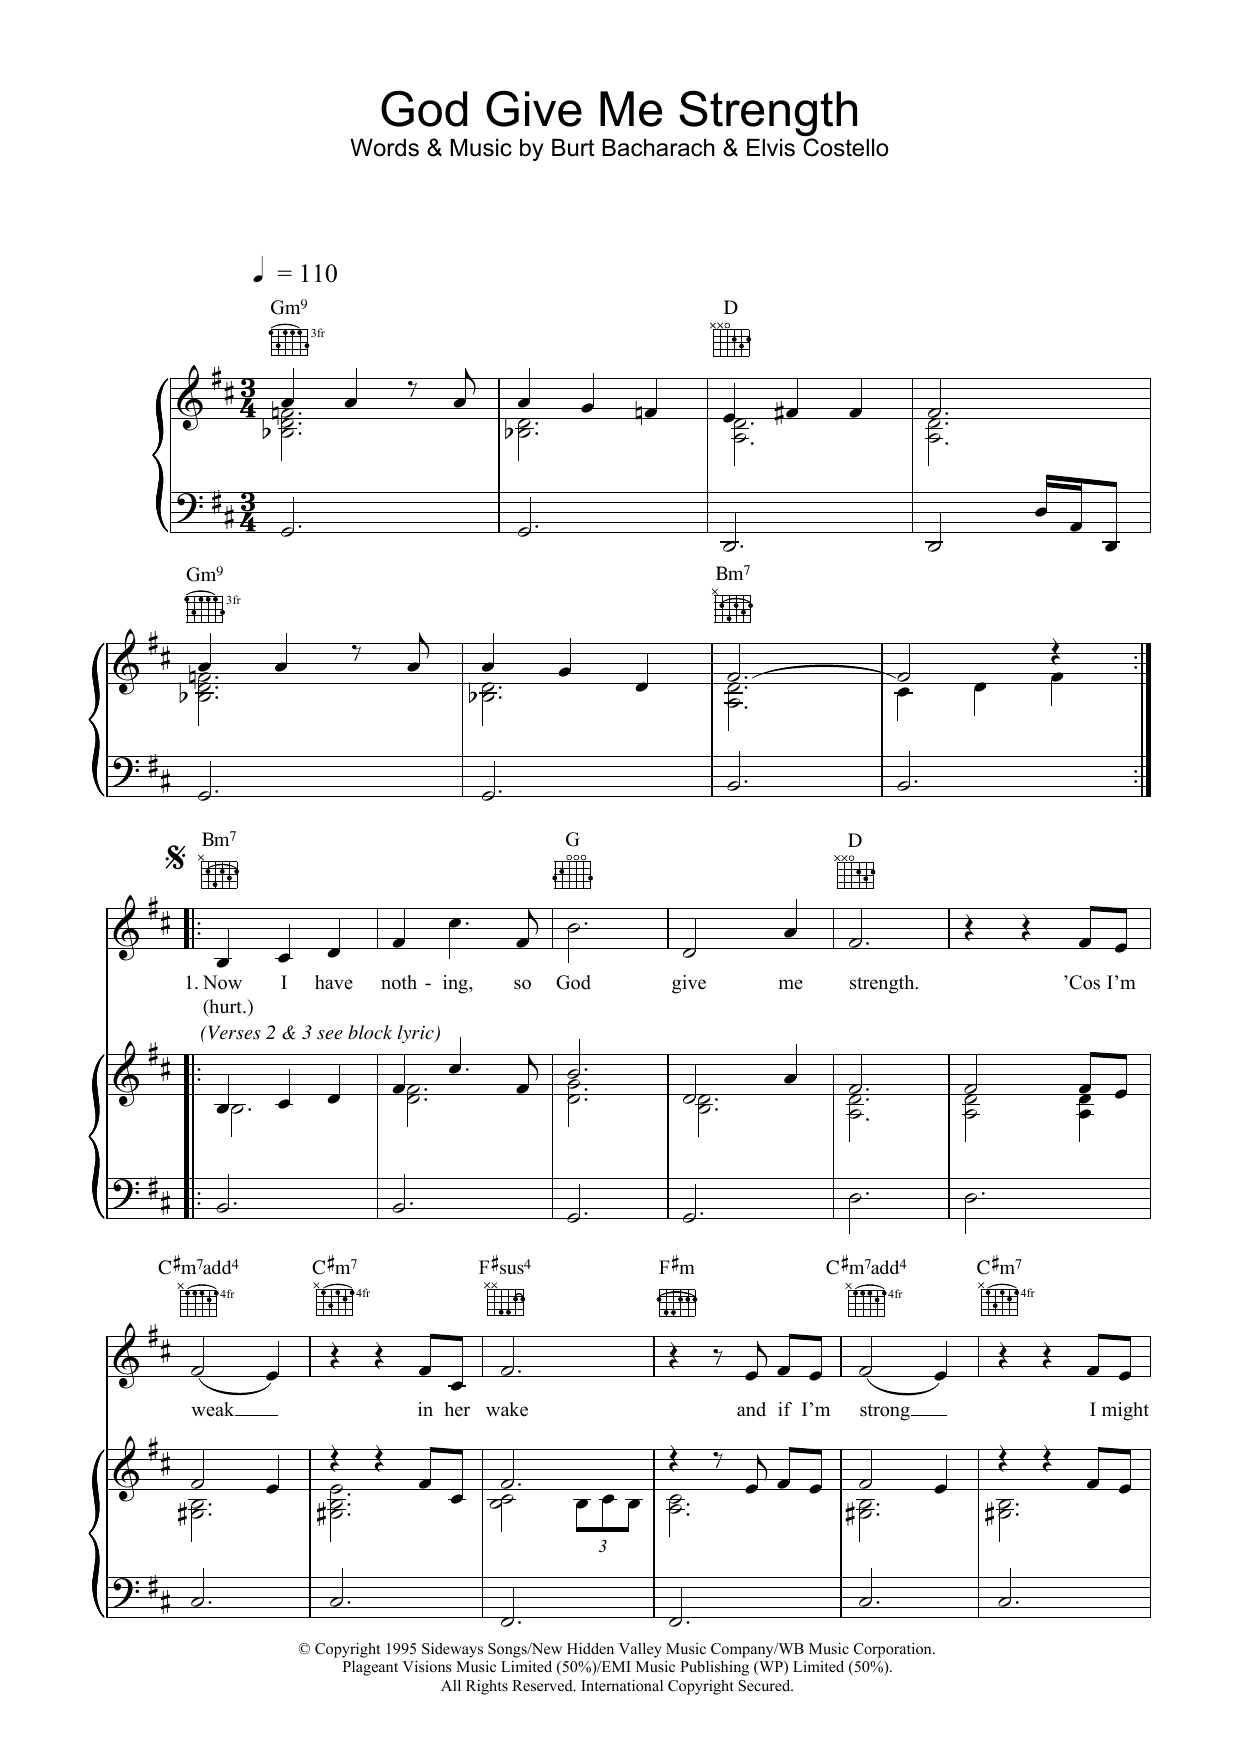 God Give Me Strength sheet music